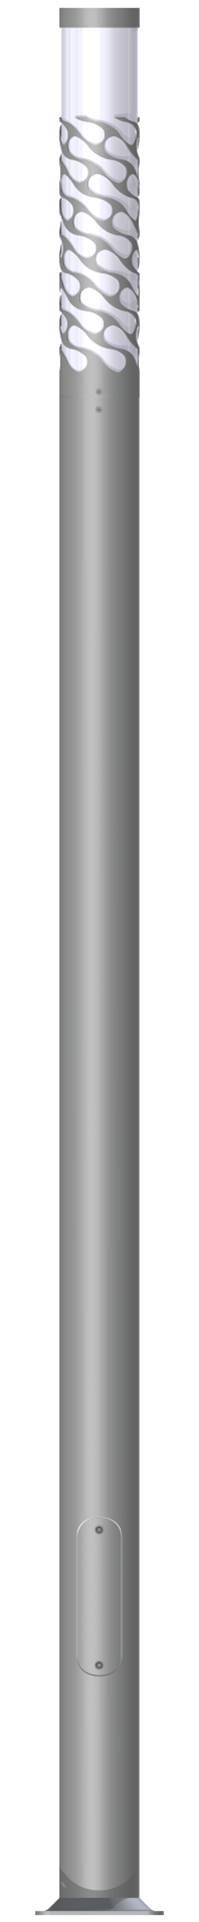 COLONNE LED KARIN DECOR 4800 LED